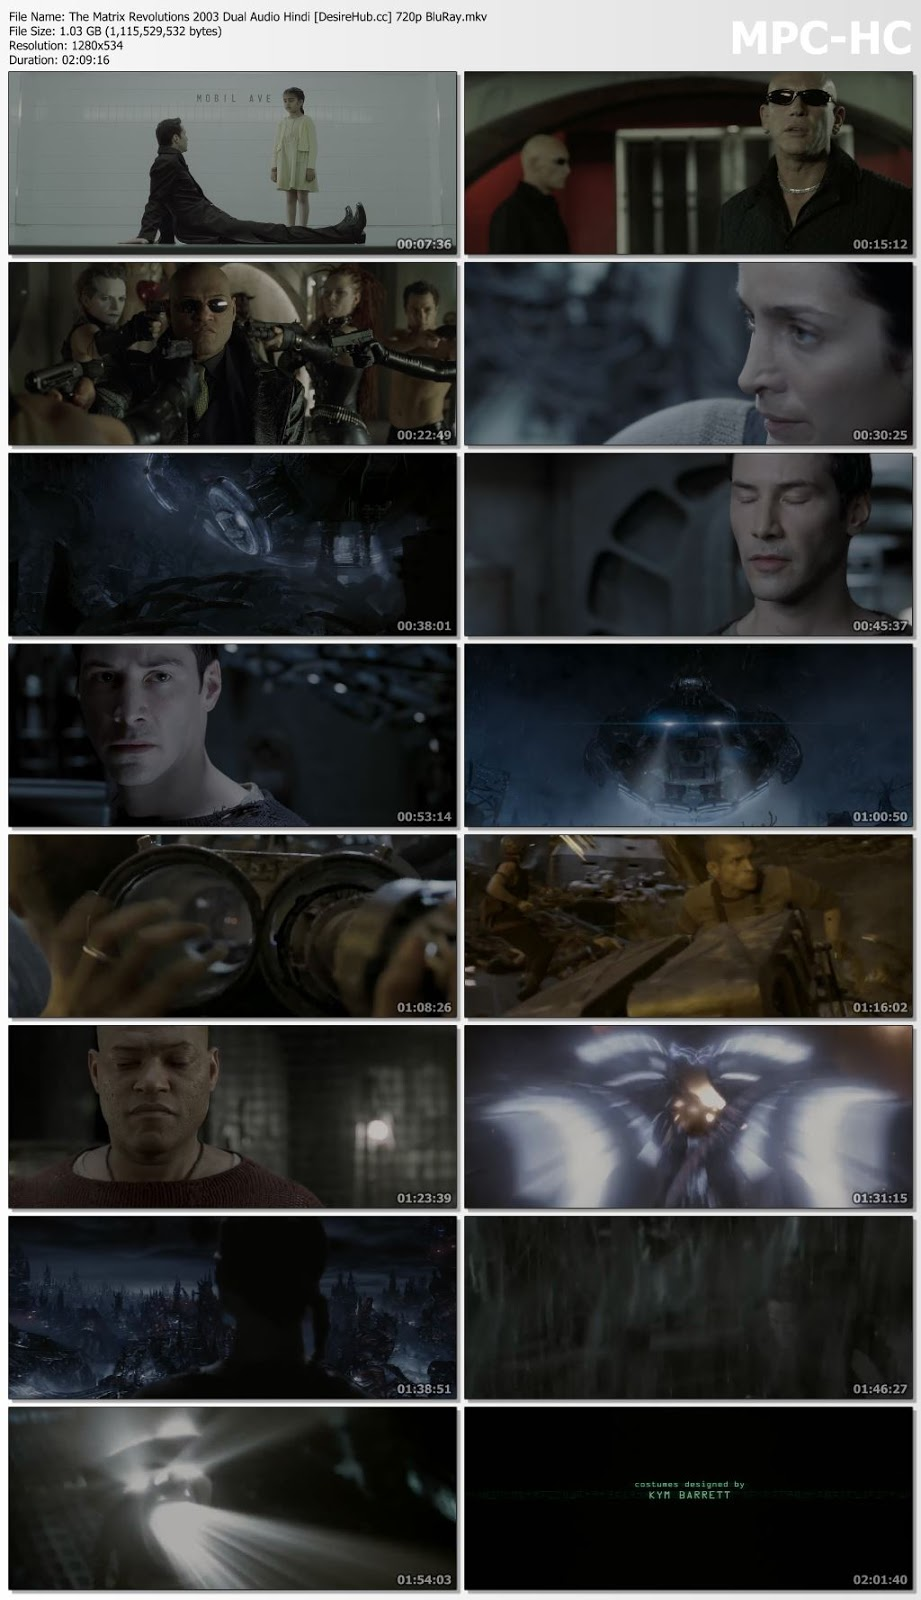 The Matrix Revolutions 2003 Dual Audio Hindi 720p BluRay 1GB Desirehub